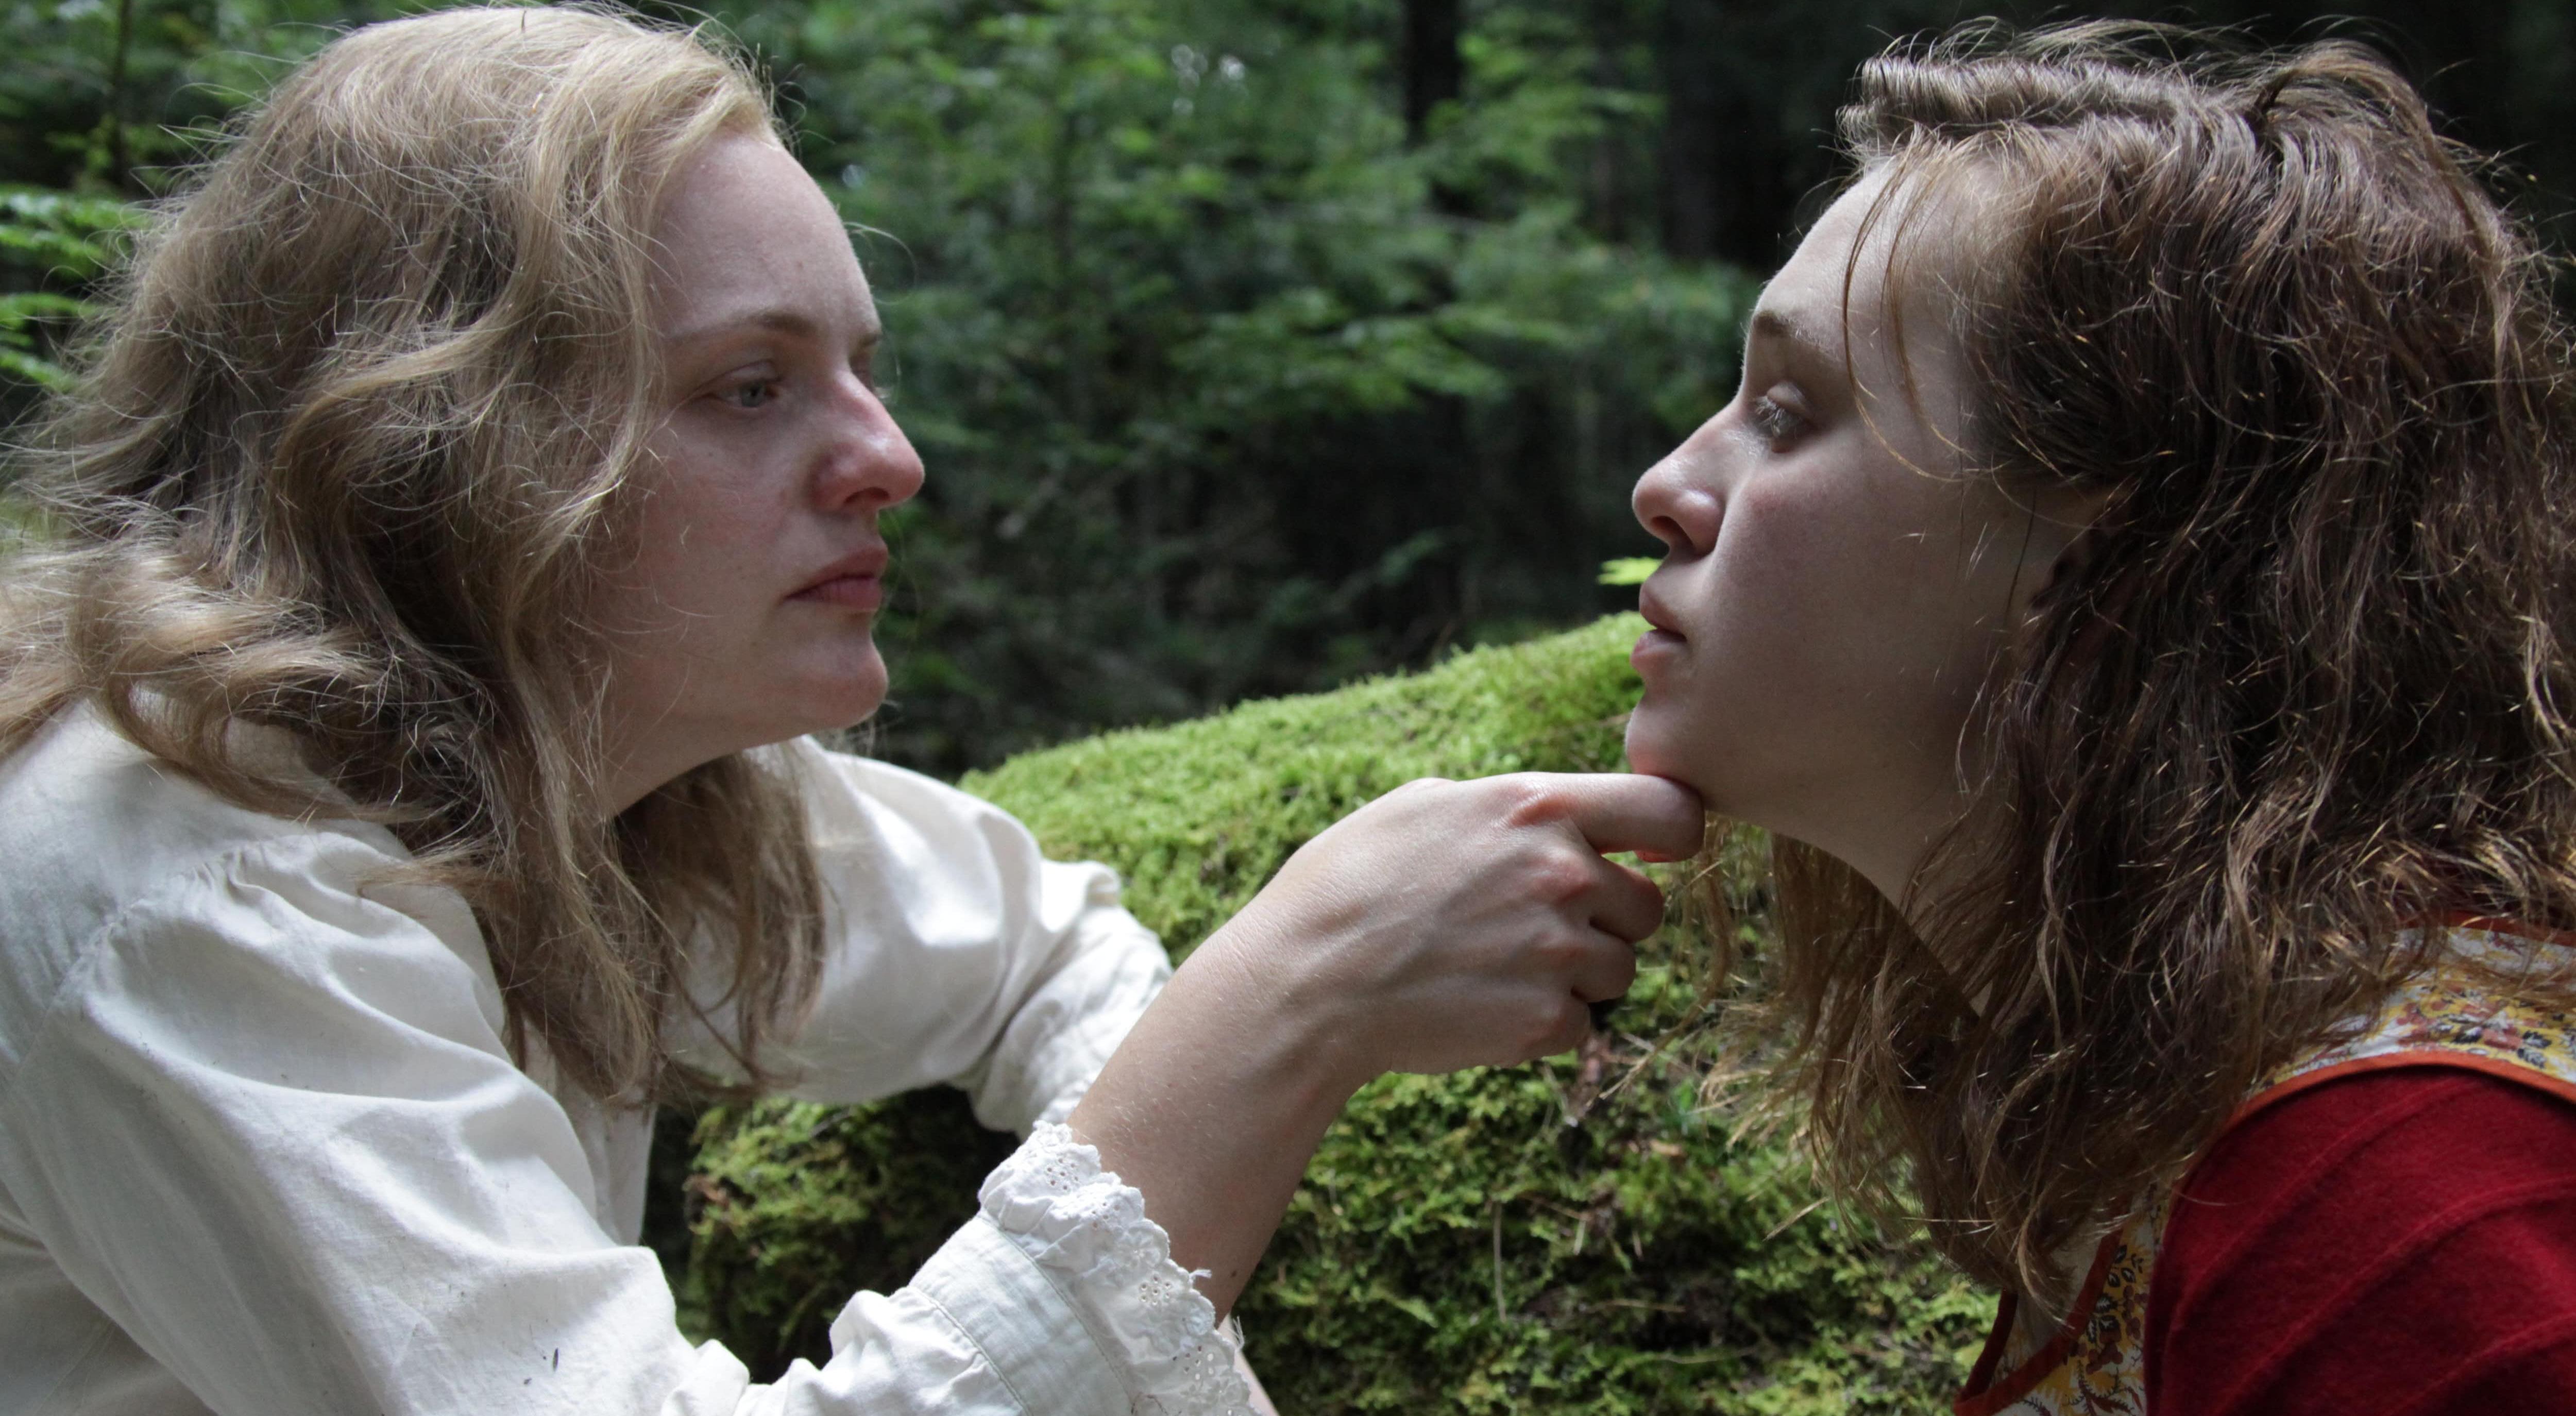 shirley jackson elisabeth moss odessa young rose mushrooms josephine decker hangsaman lottery neon hulu london film festival